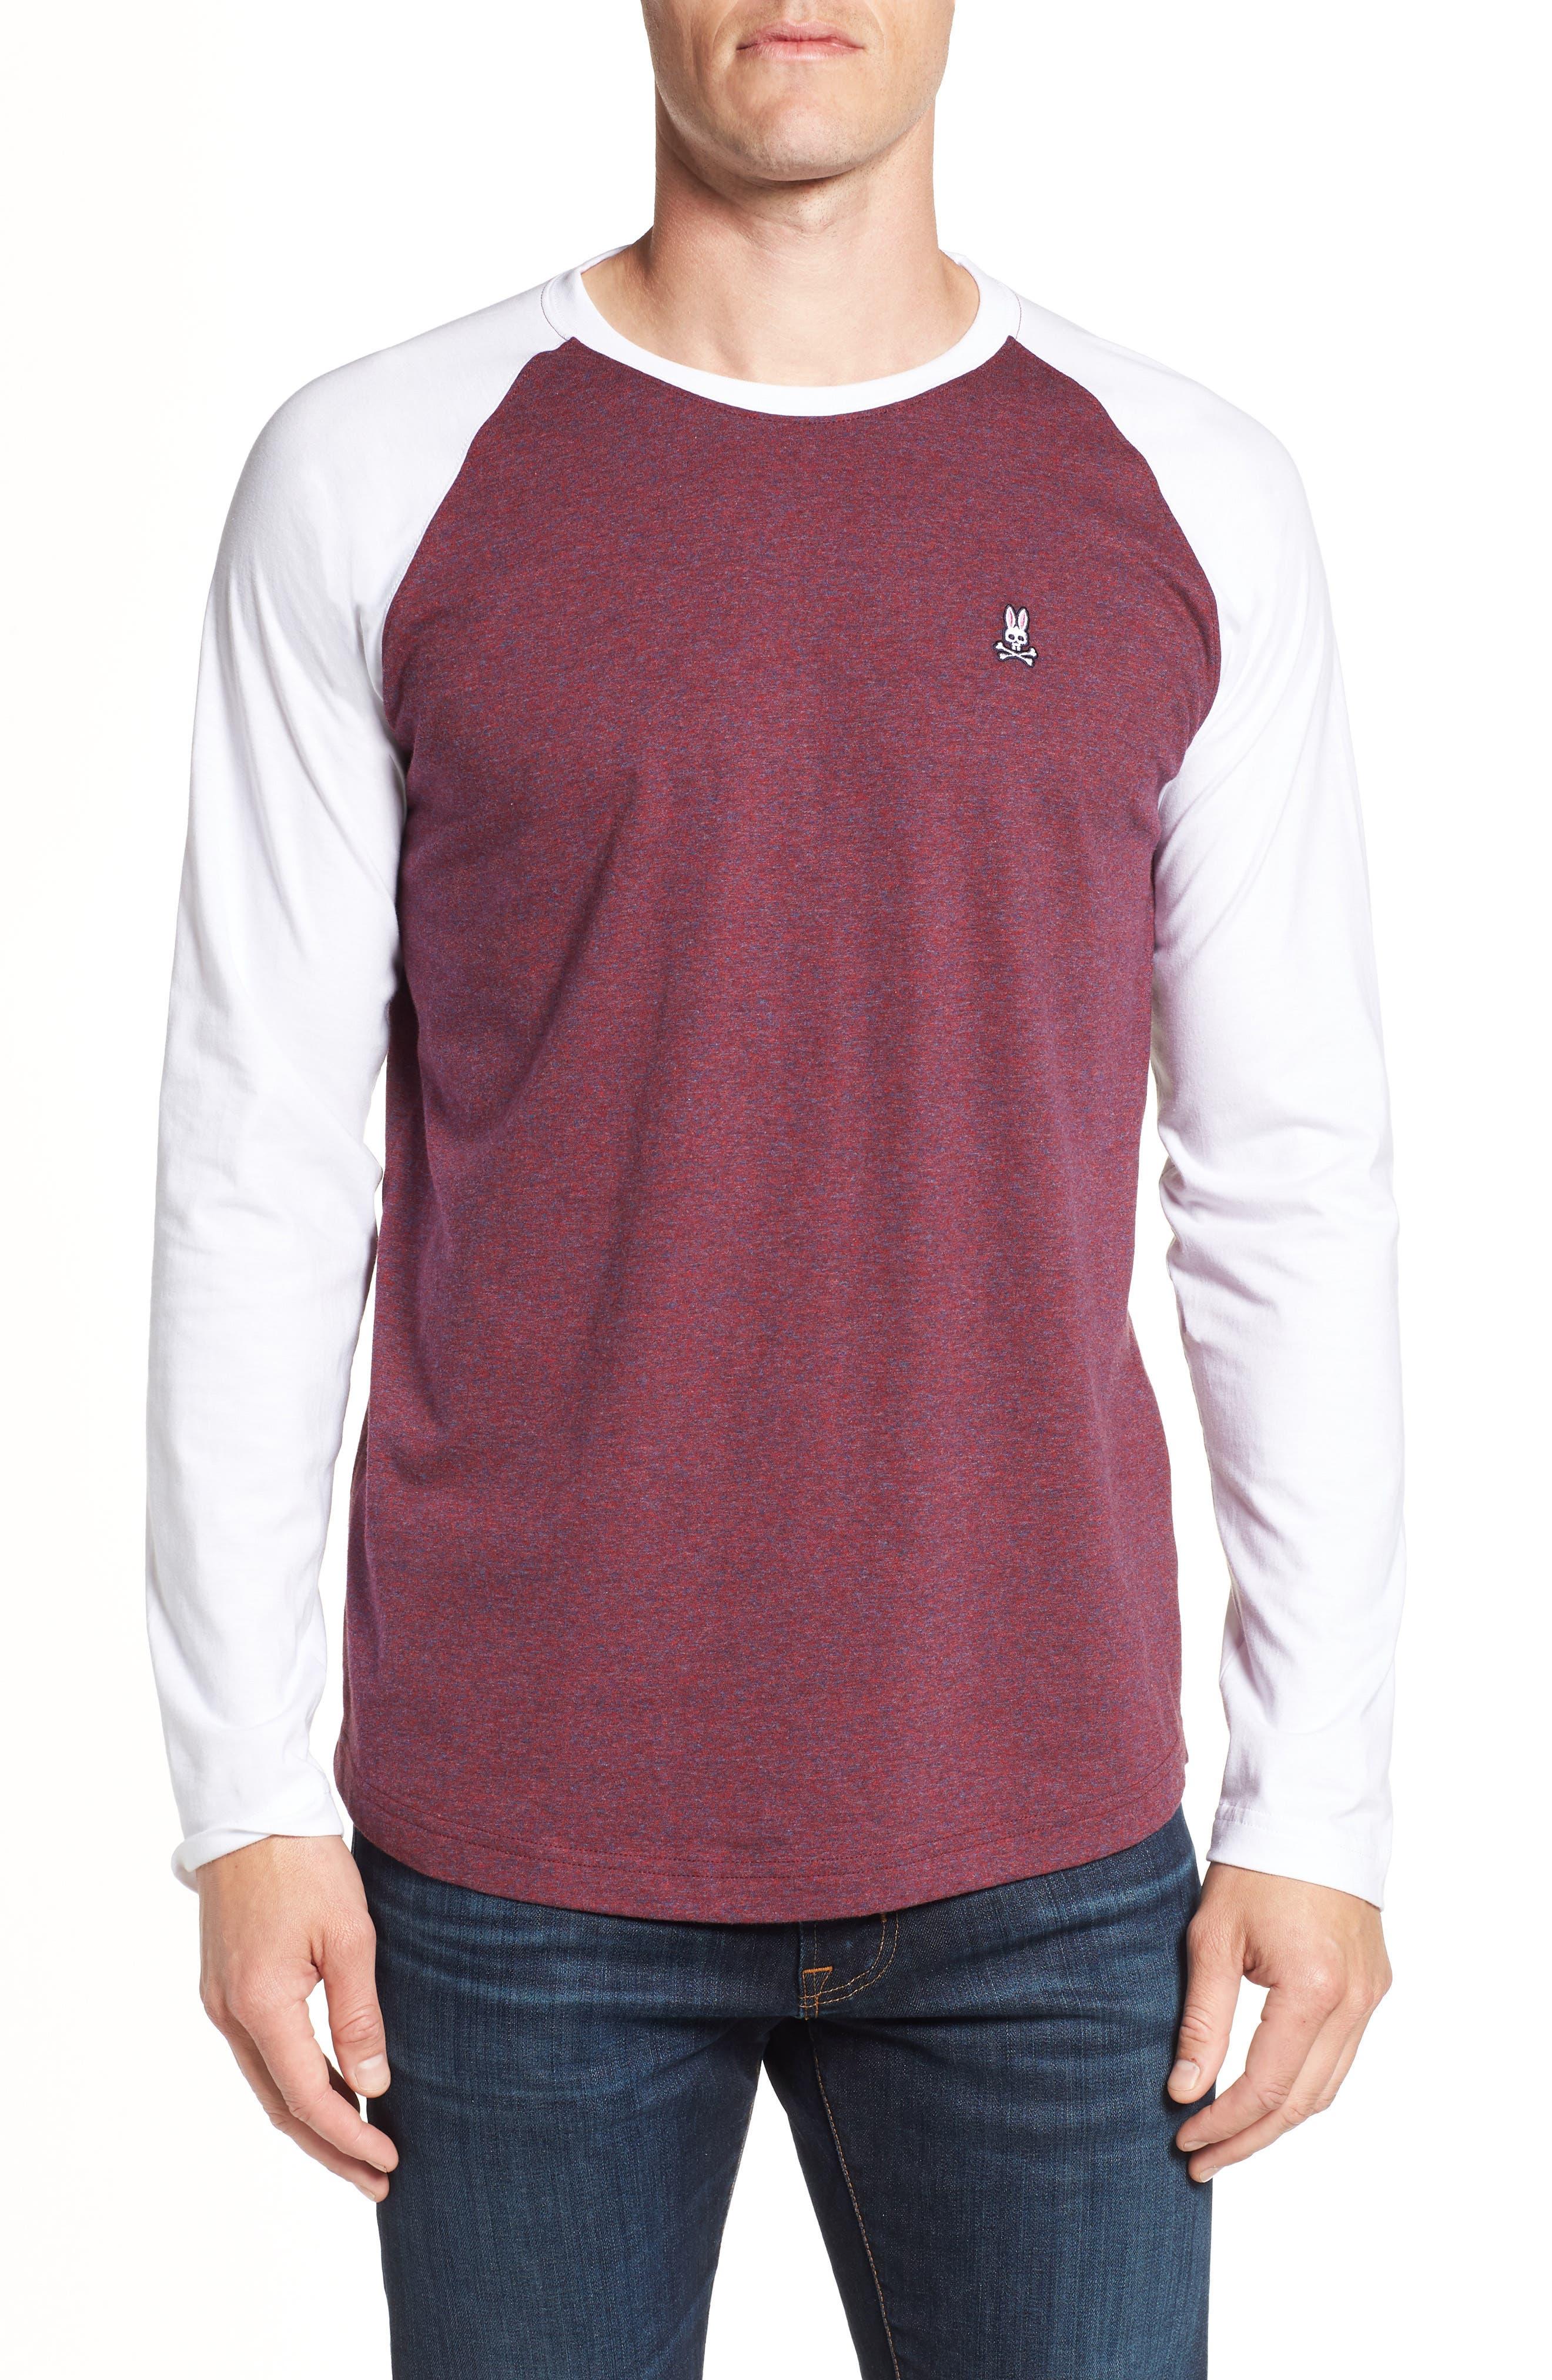 Cobb Raglan T-Shirt,                             Main thumbnail 1, color,                             BURGUNDY SALT PEPPER